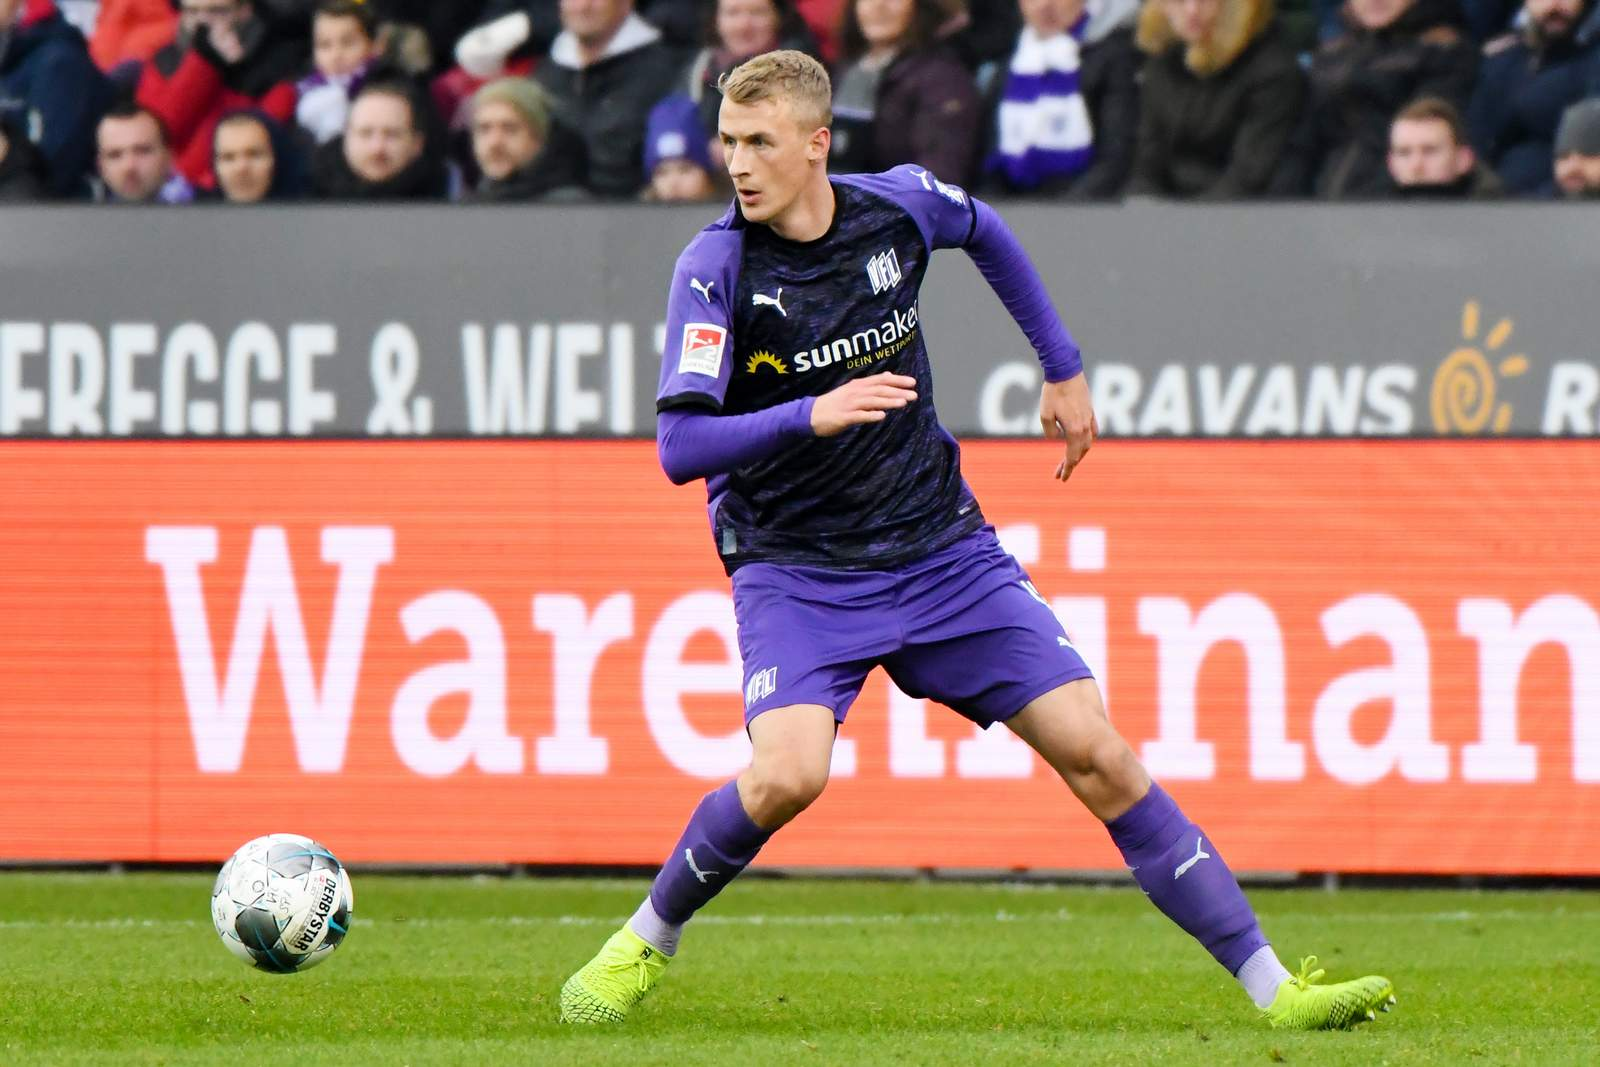 Lukas Gugganig vom VfL Osnabrück